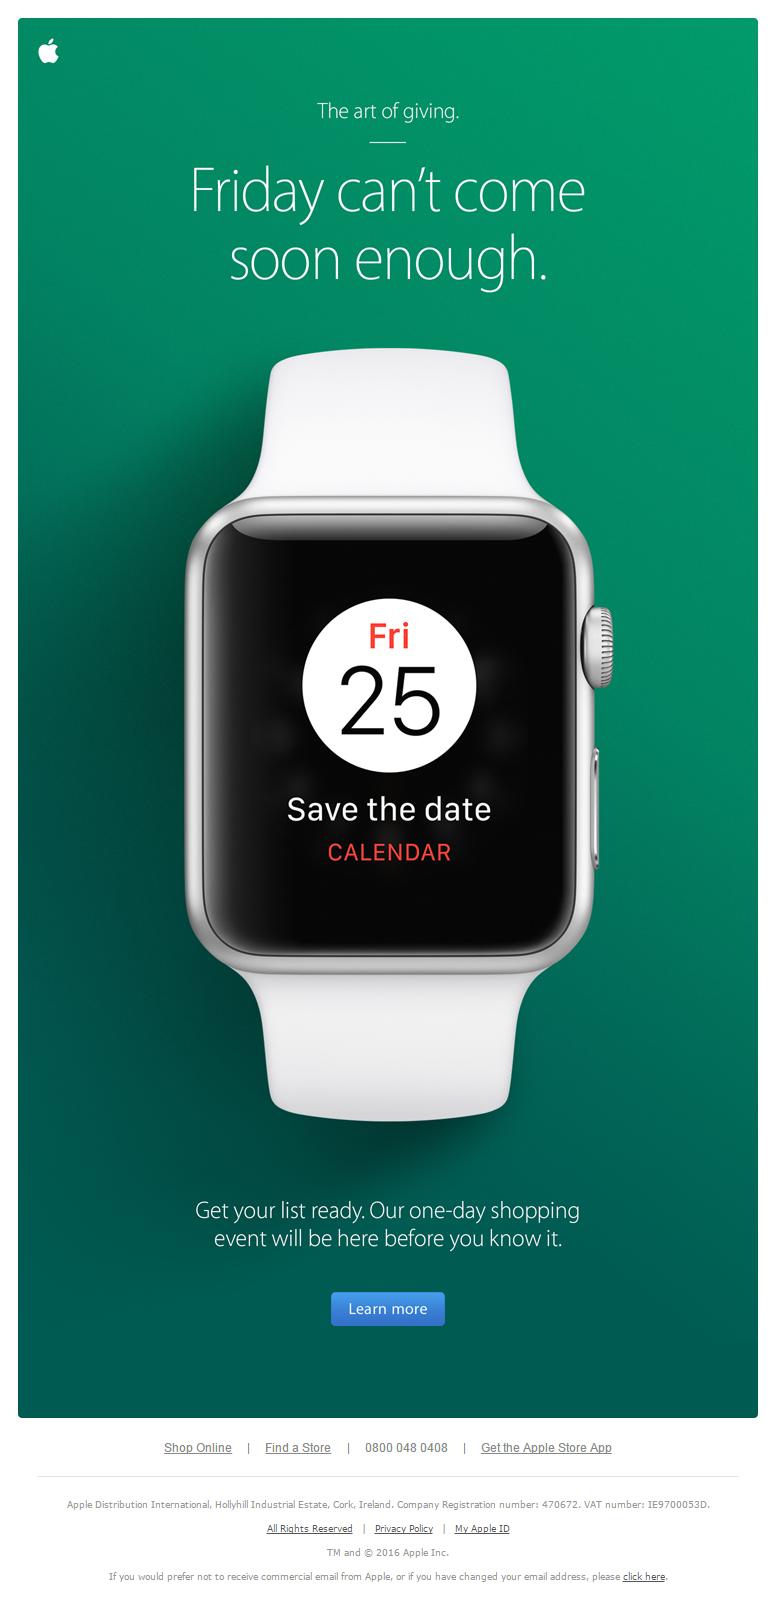 Black Friday Teaser Email From Apple Emailmarketing Email Marketing Blackfriday Black Frid Black Friday Email Apple Advertising Black Friday Email Design